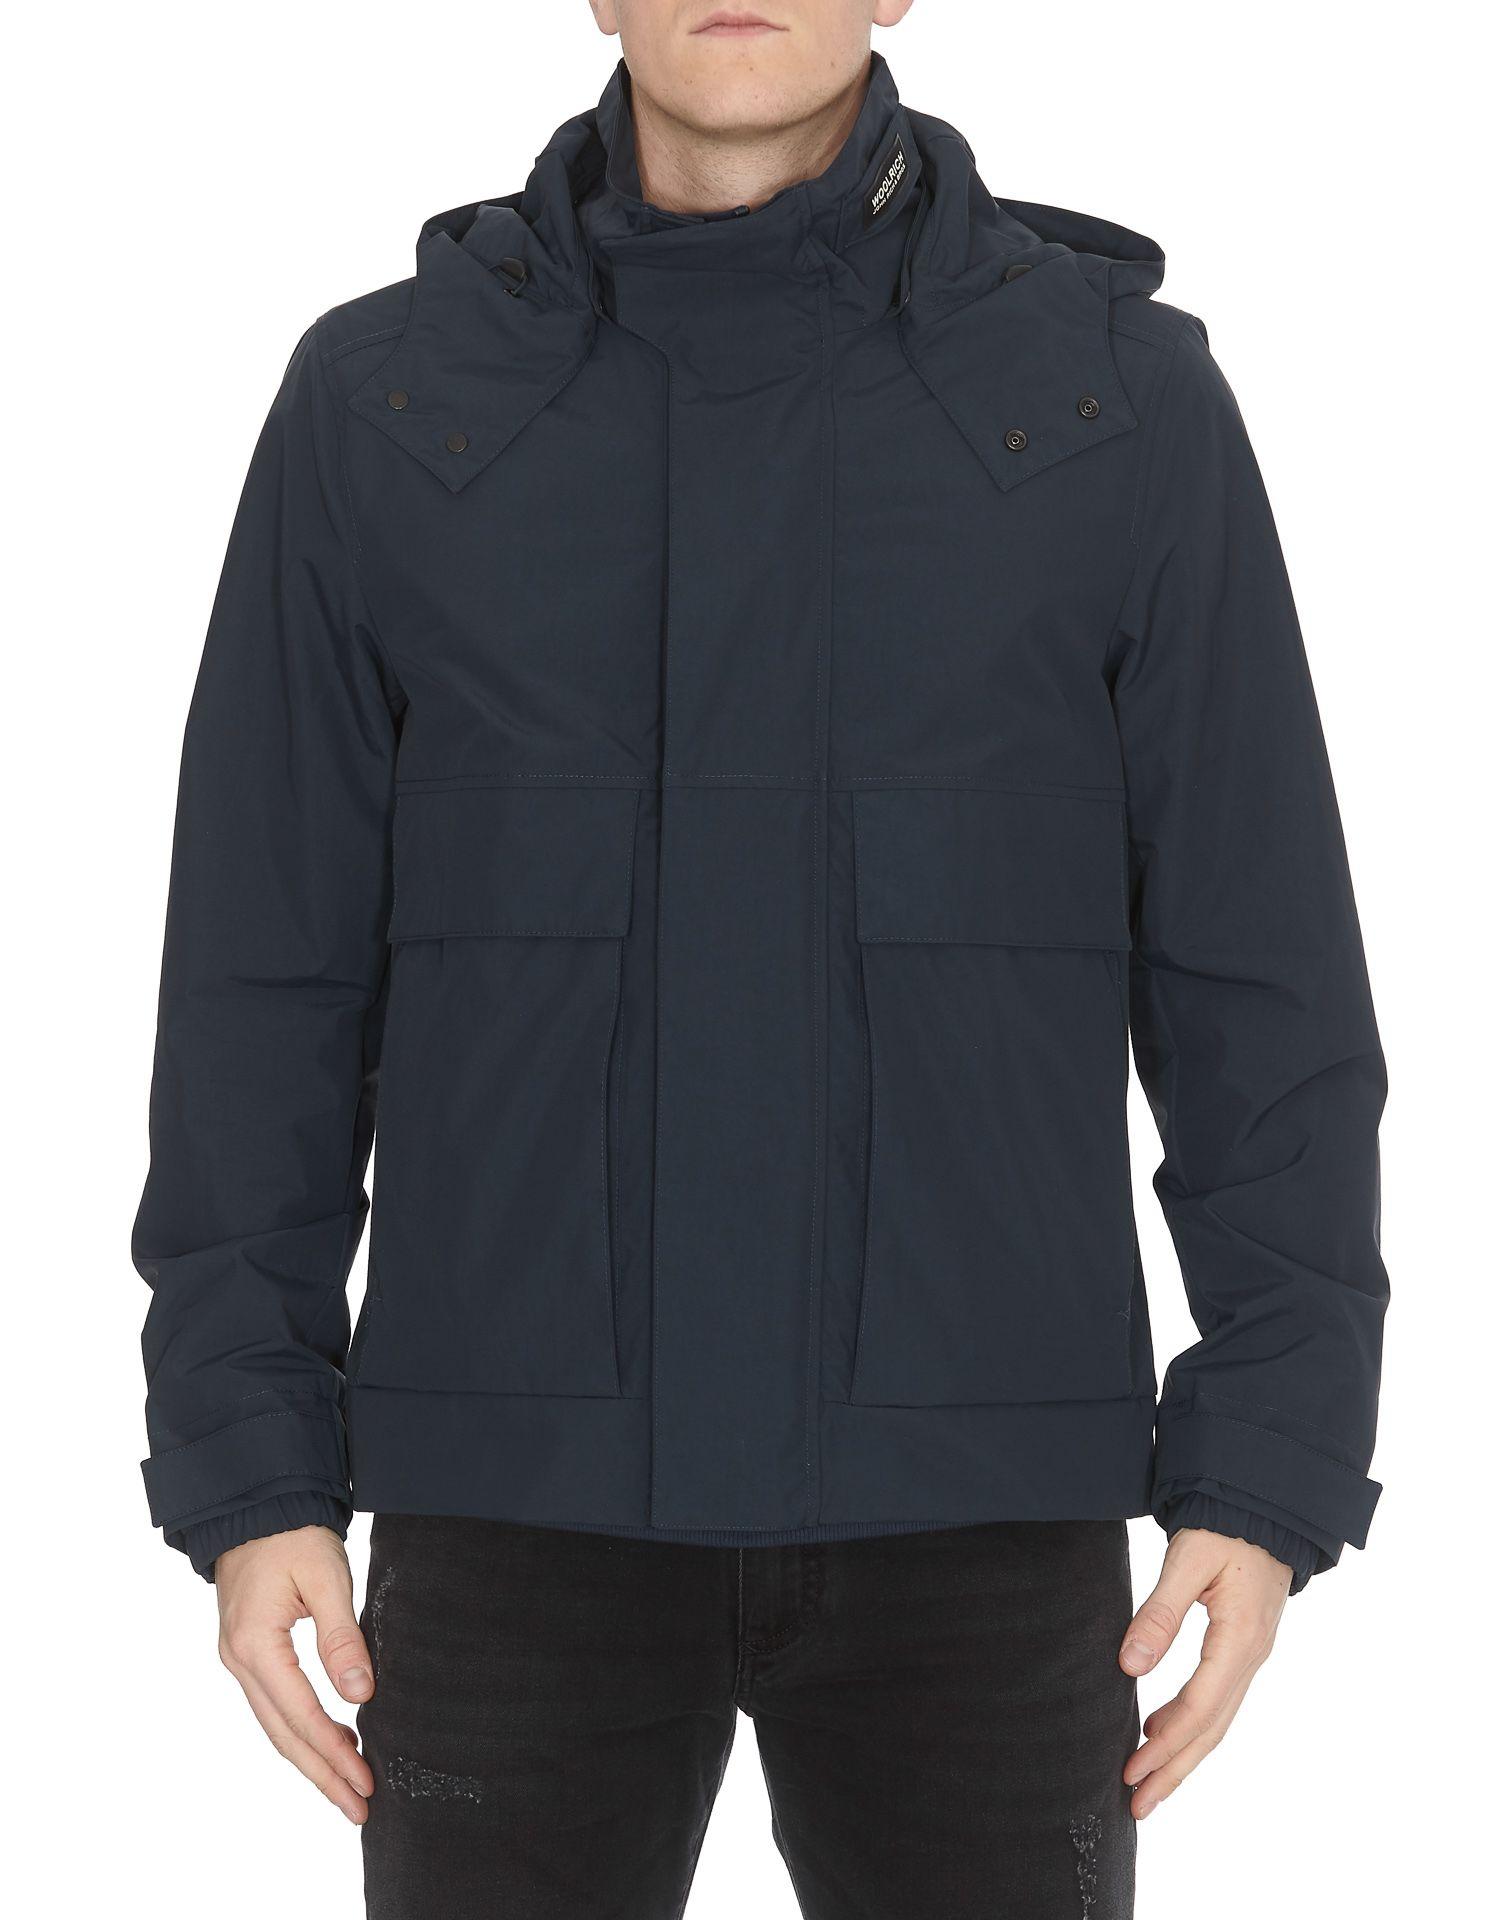 Woolrich Sailing Jacket